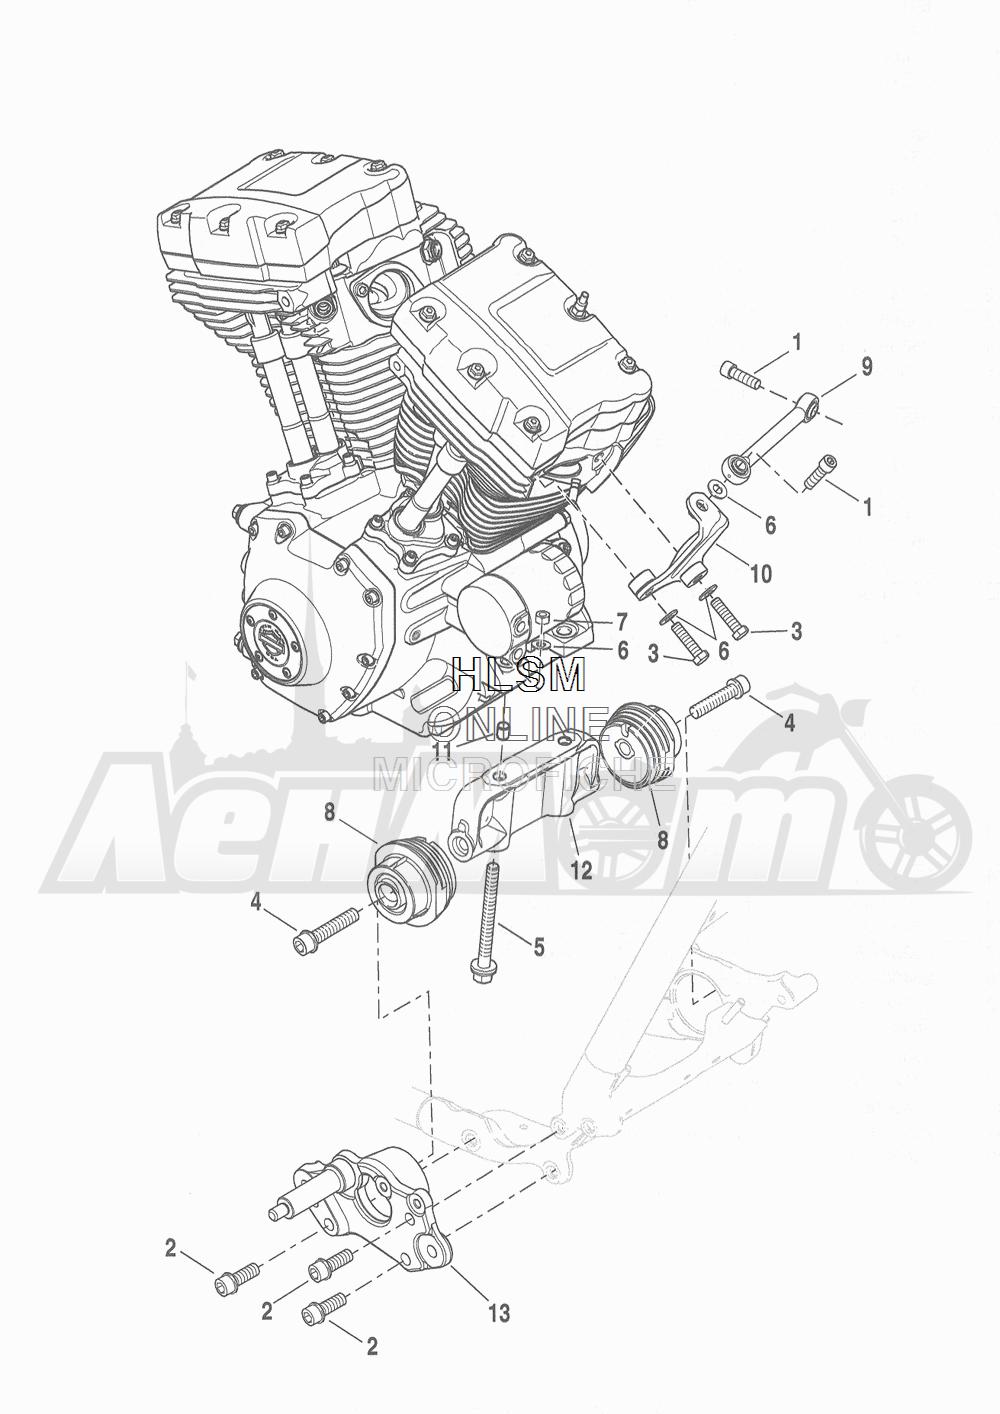 Запчасти для Мотоцикла Harley-Davidson 2016 FLHTCU TC ELECTRA GLIDE ULTRA CLASSIC (KSL) Раздел: ENGINE MOUNTS W/ STABILIZER LINK   опоры двигателя вместе с стабилизатор